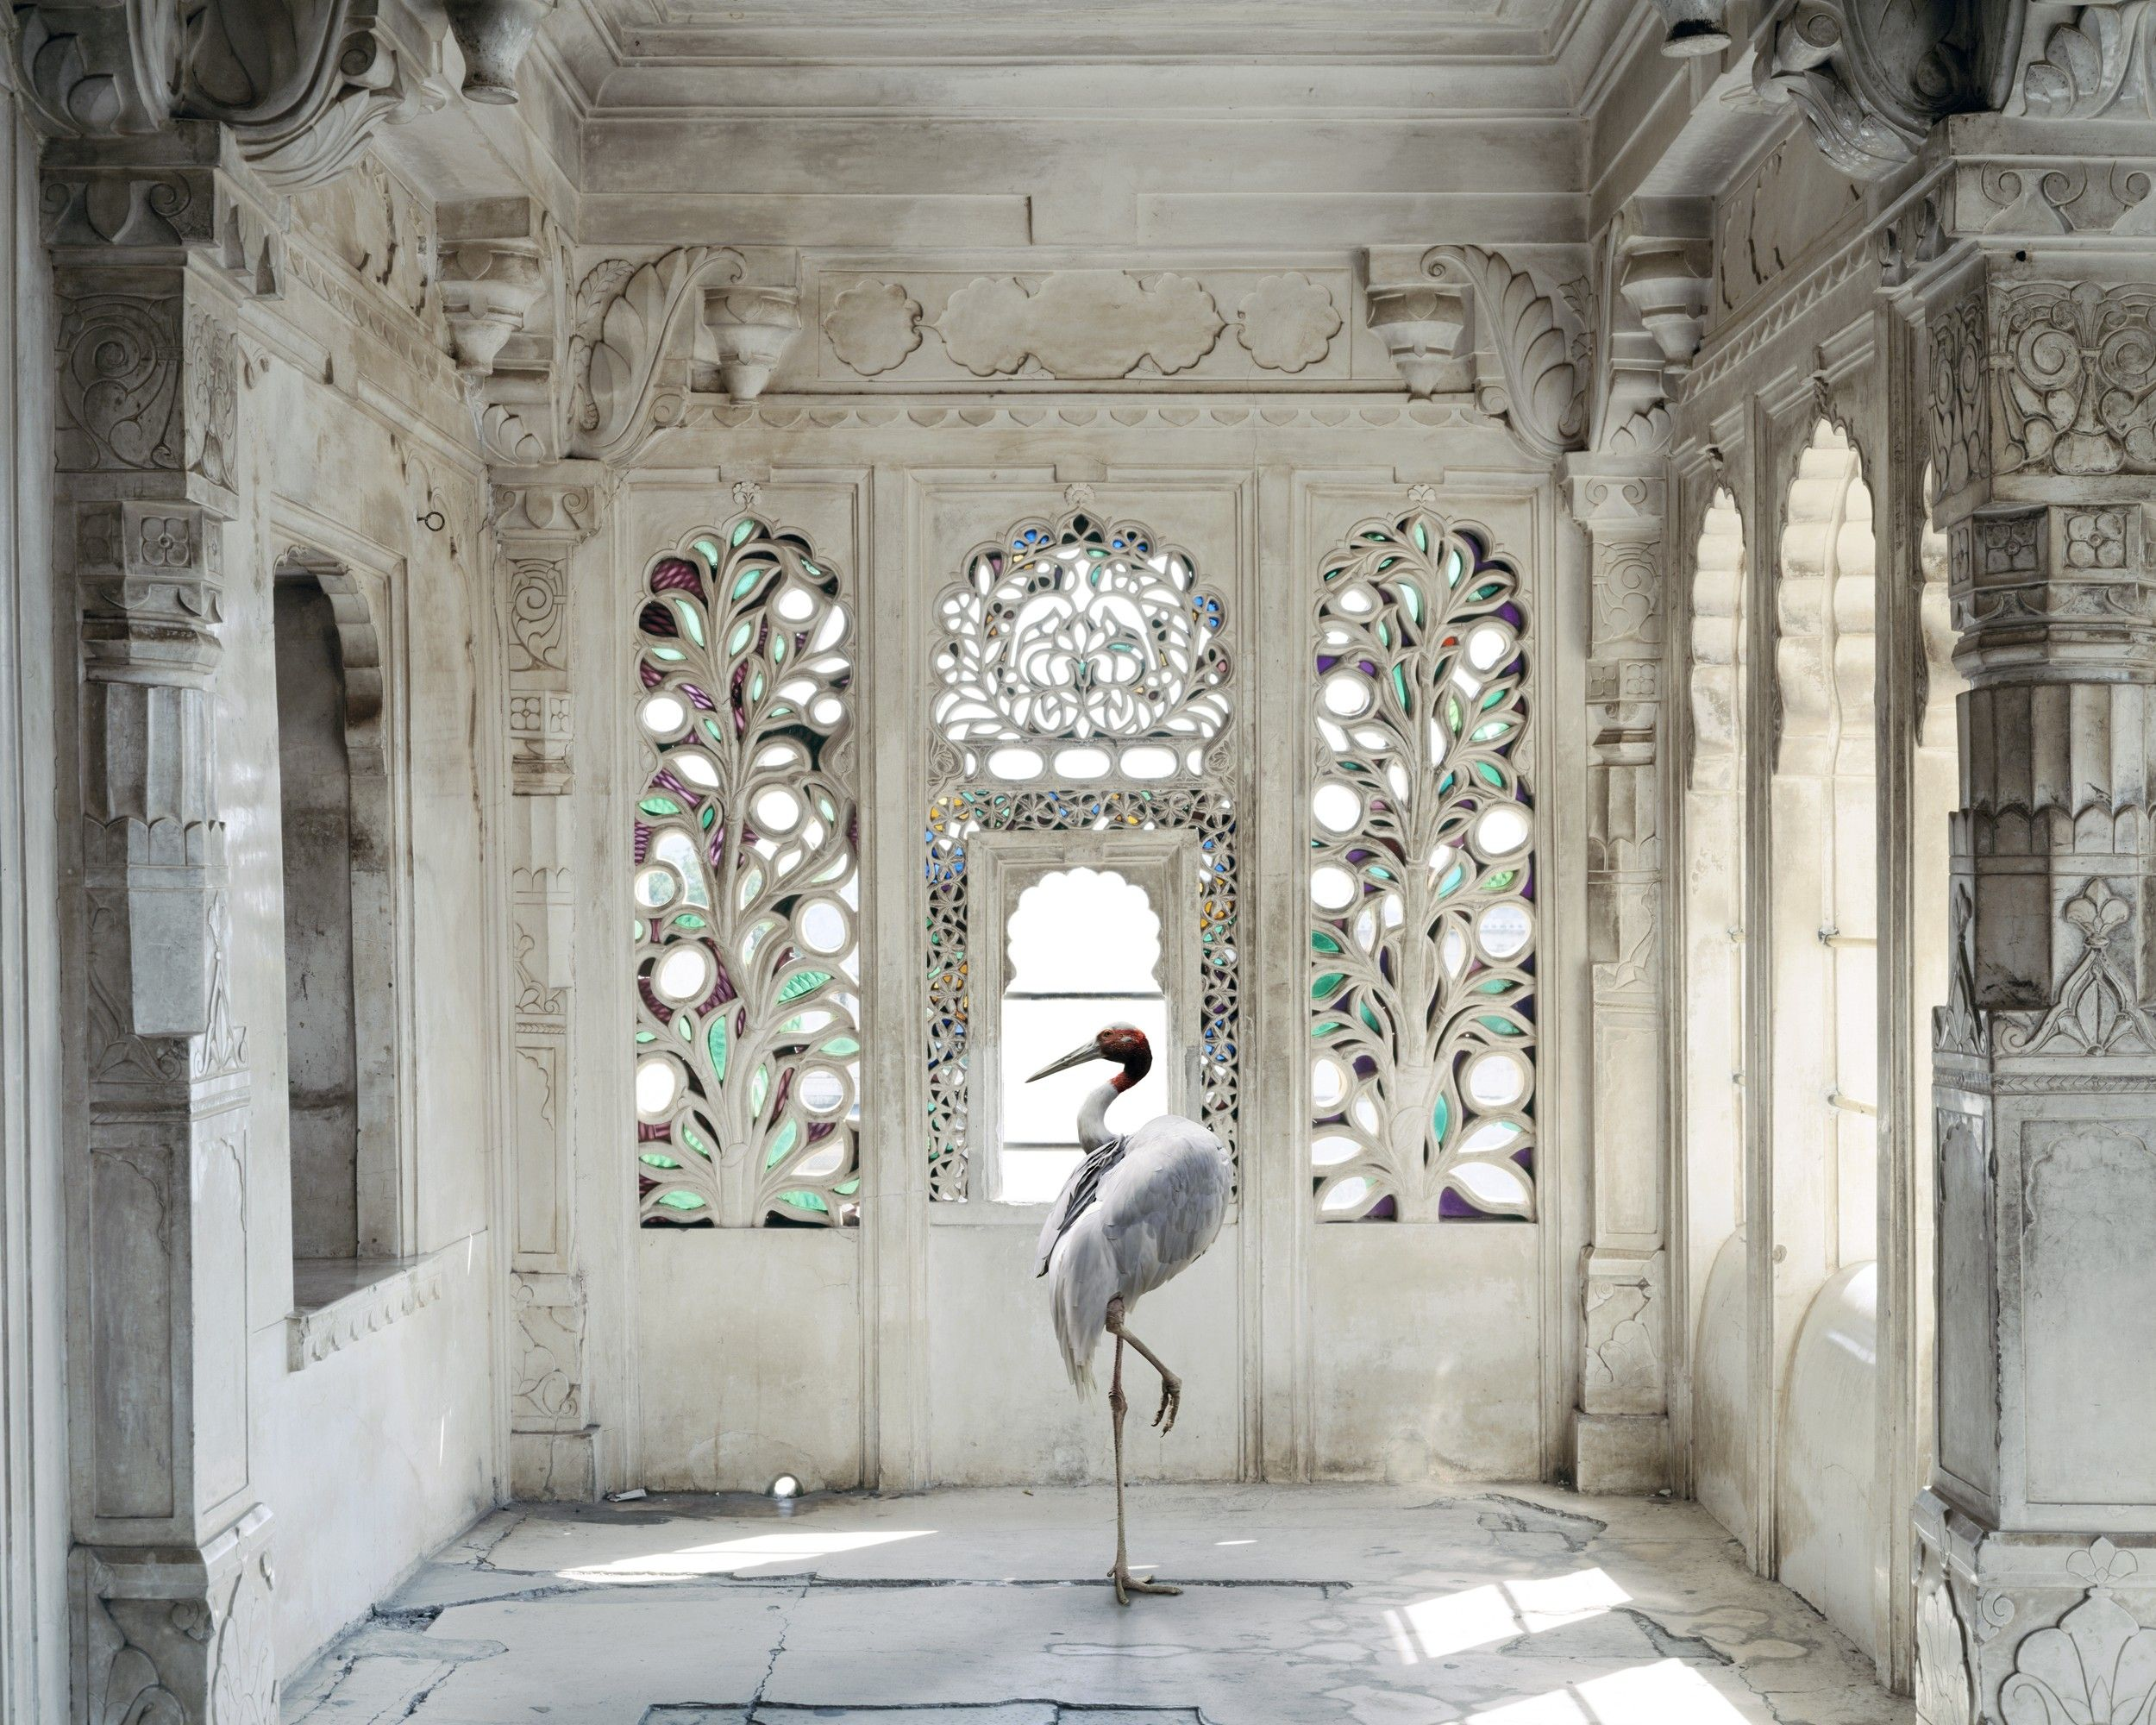 Karen Knorr, India Song